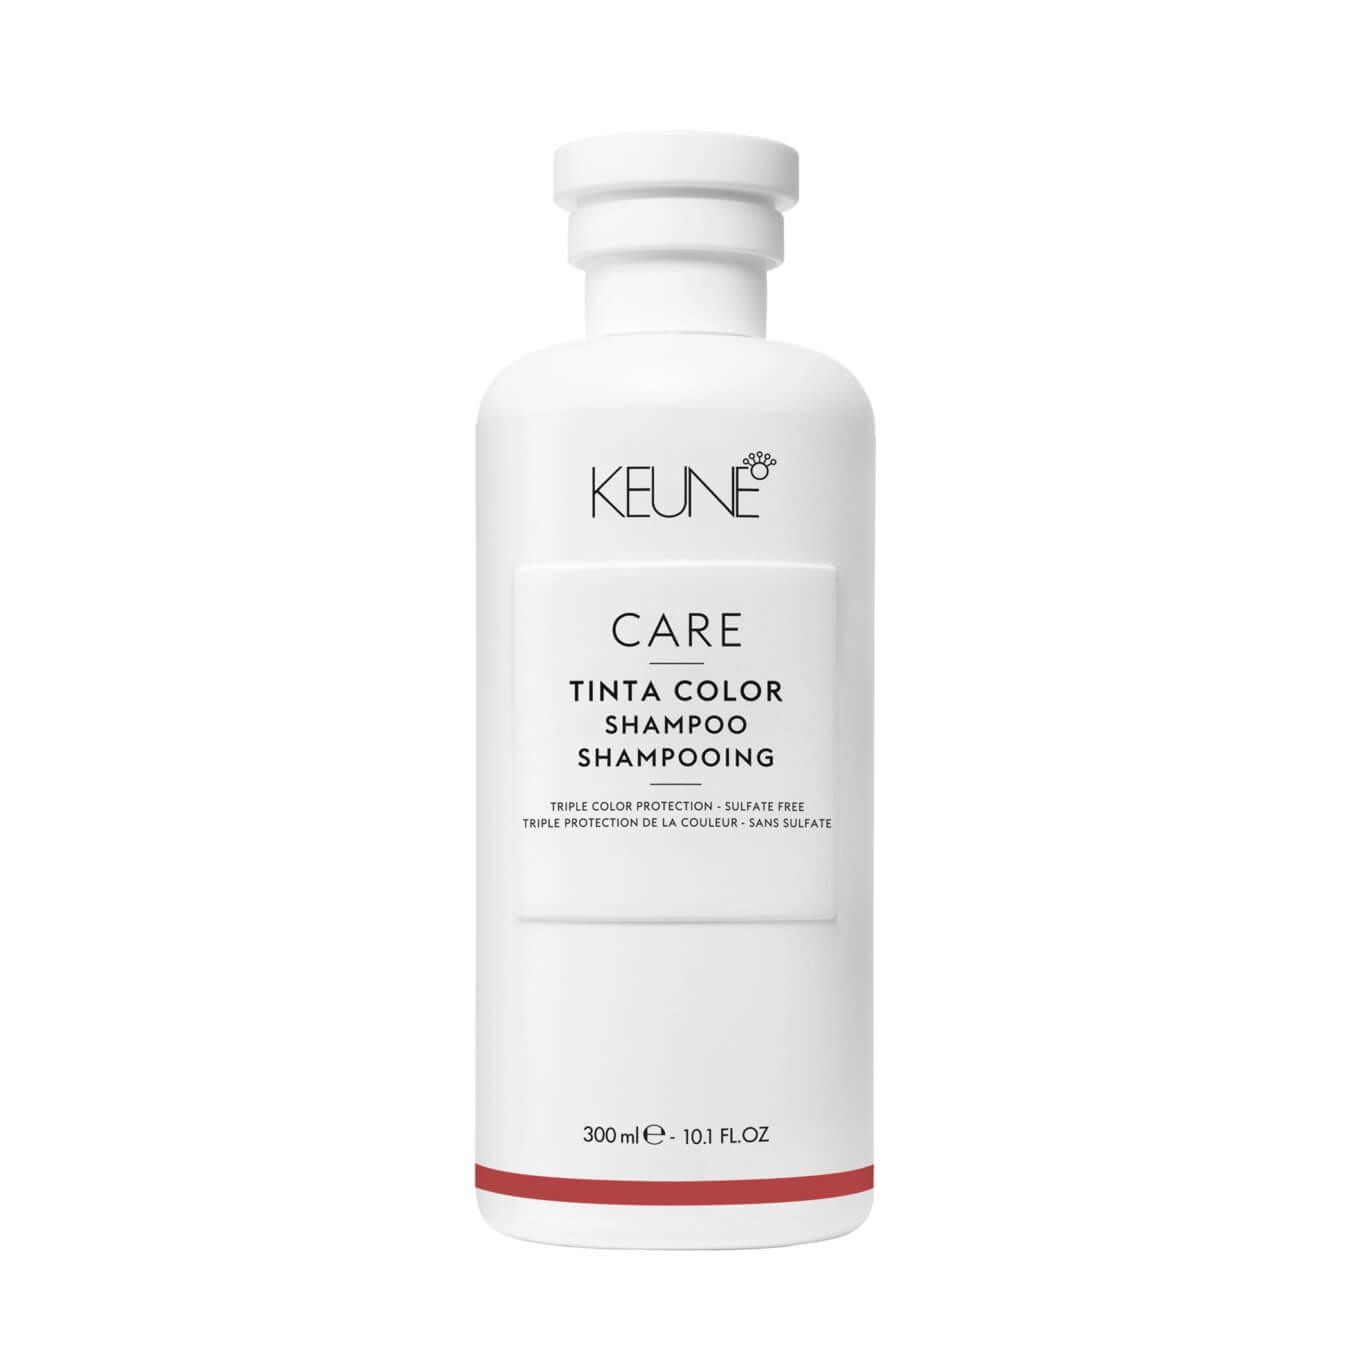 Kauf Keune Care Tinta Color Care Shampoo 300ml